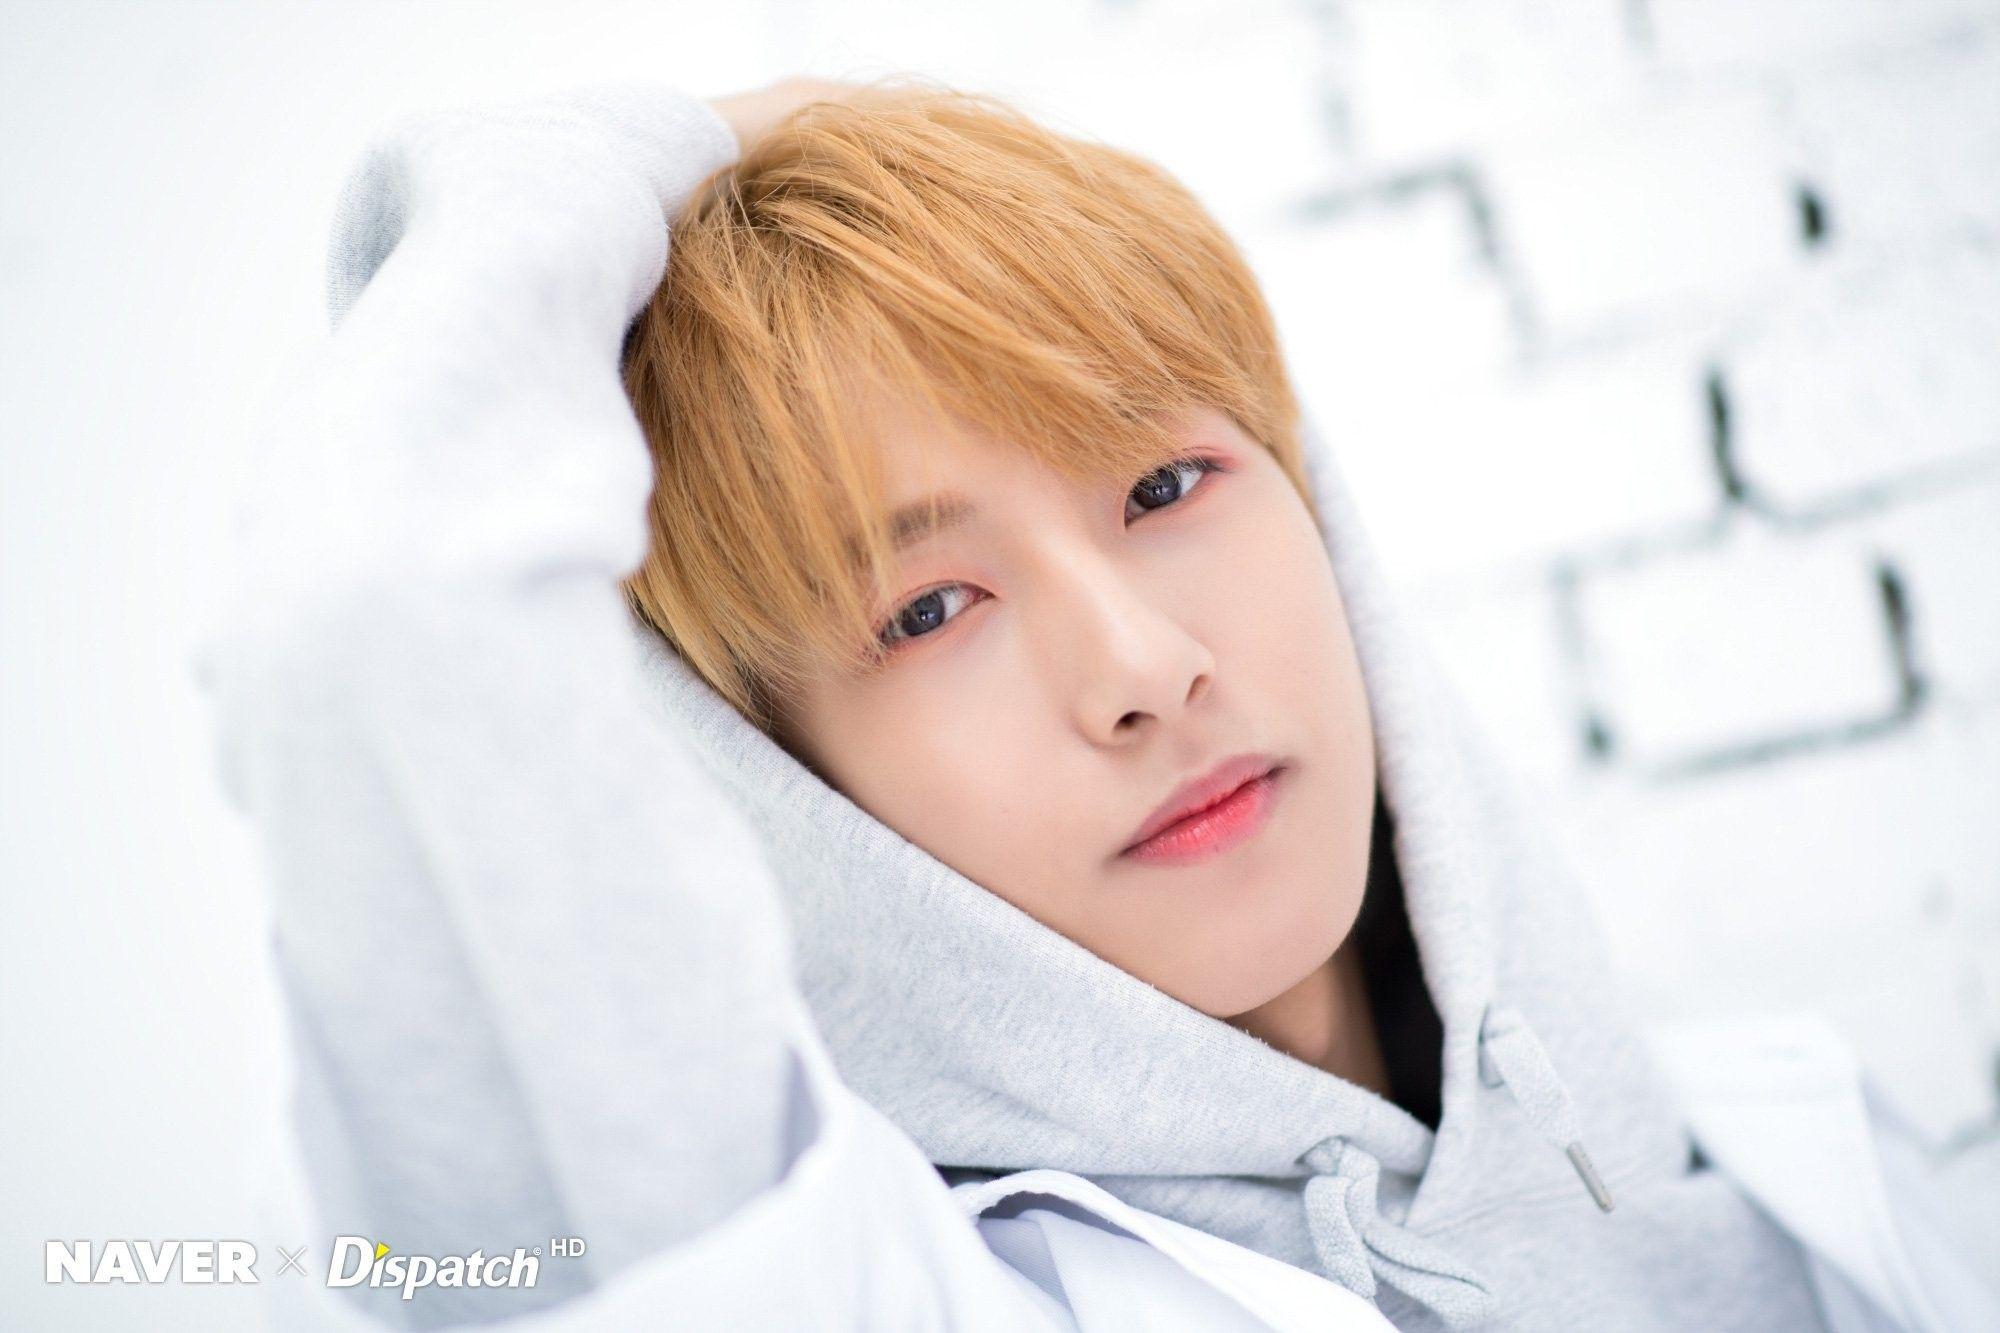 Nct Dream Renjun 180905 Naver X Dispatch We Go Up Comback